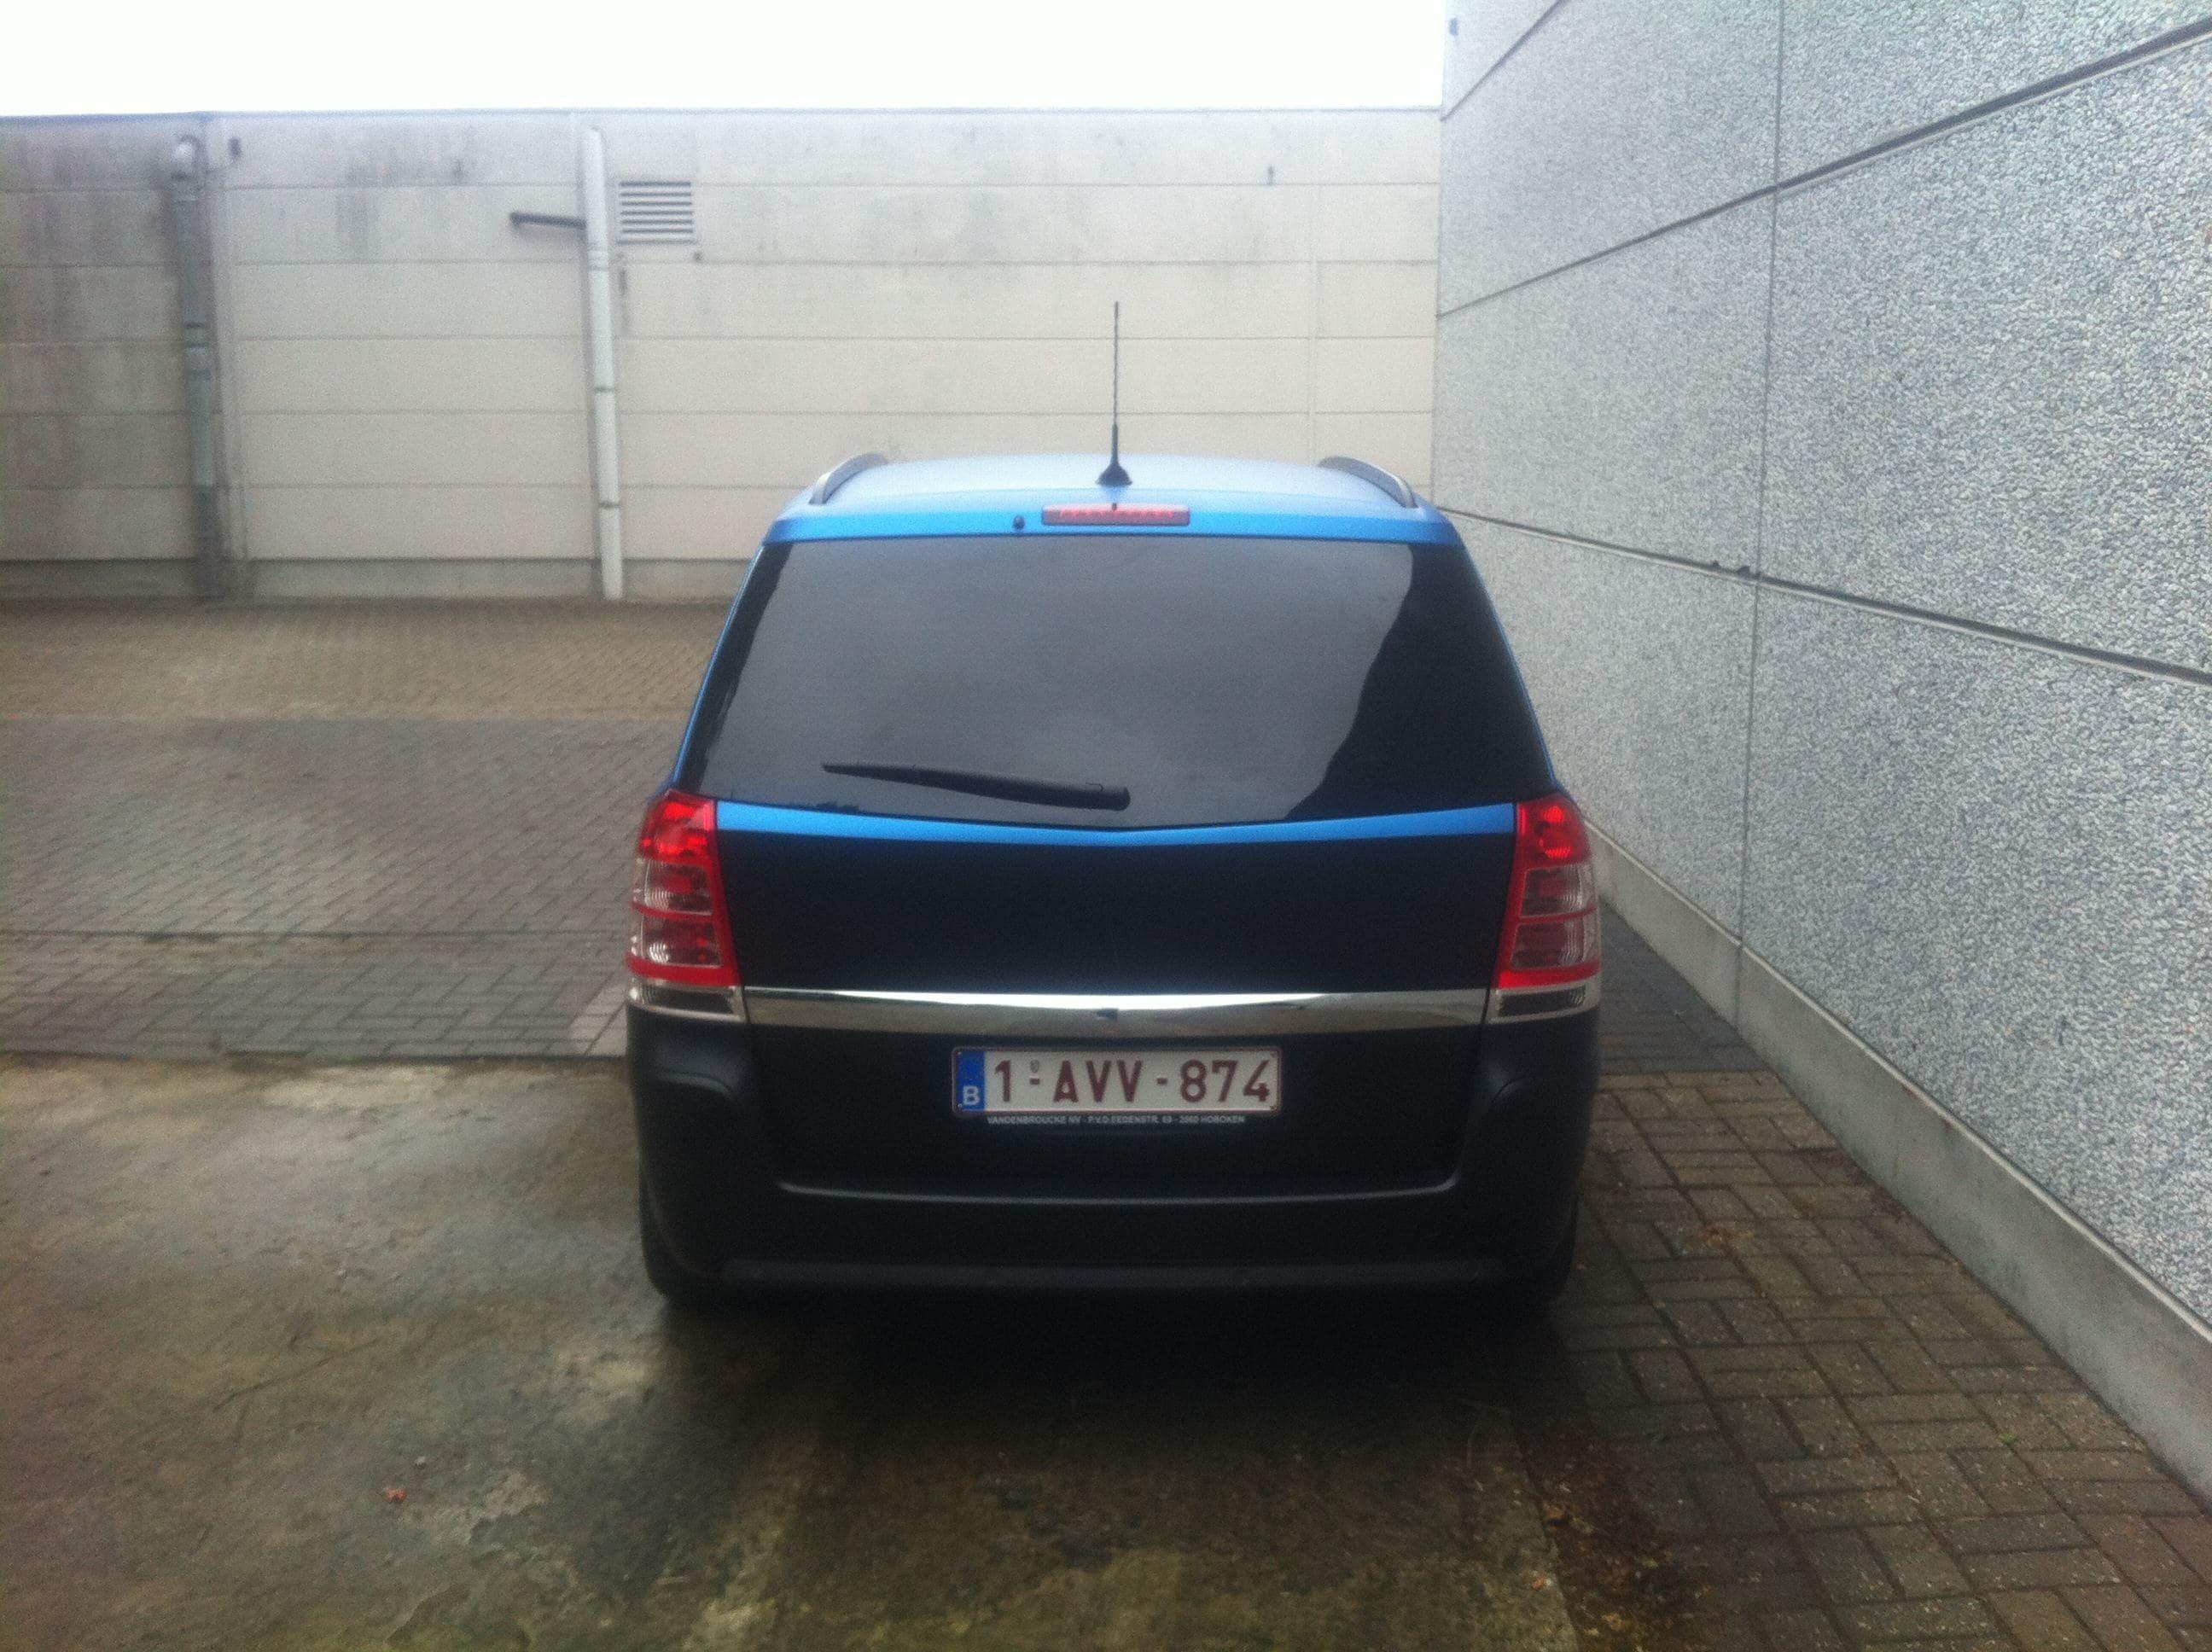 Opel Zafira met Two-Tone Wrap, Carwrapping door Wrapmyride.nu Foto-nr:6667, ©2021